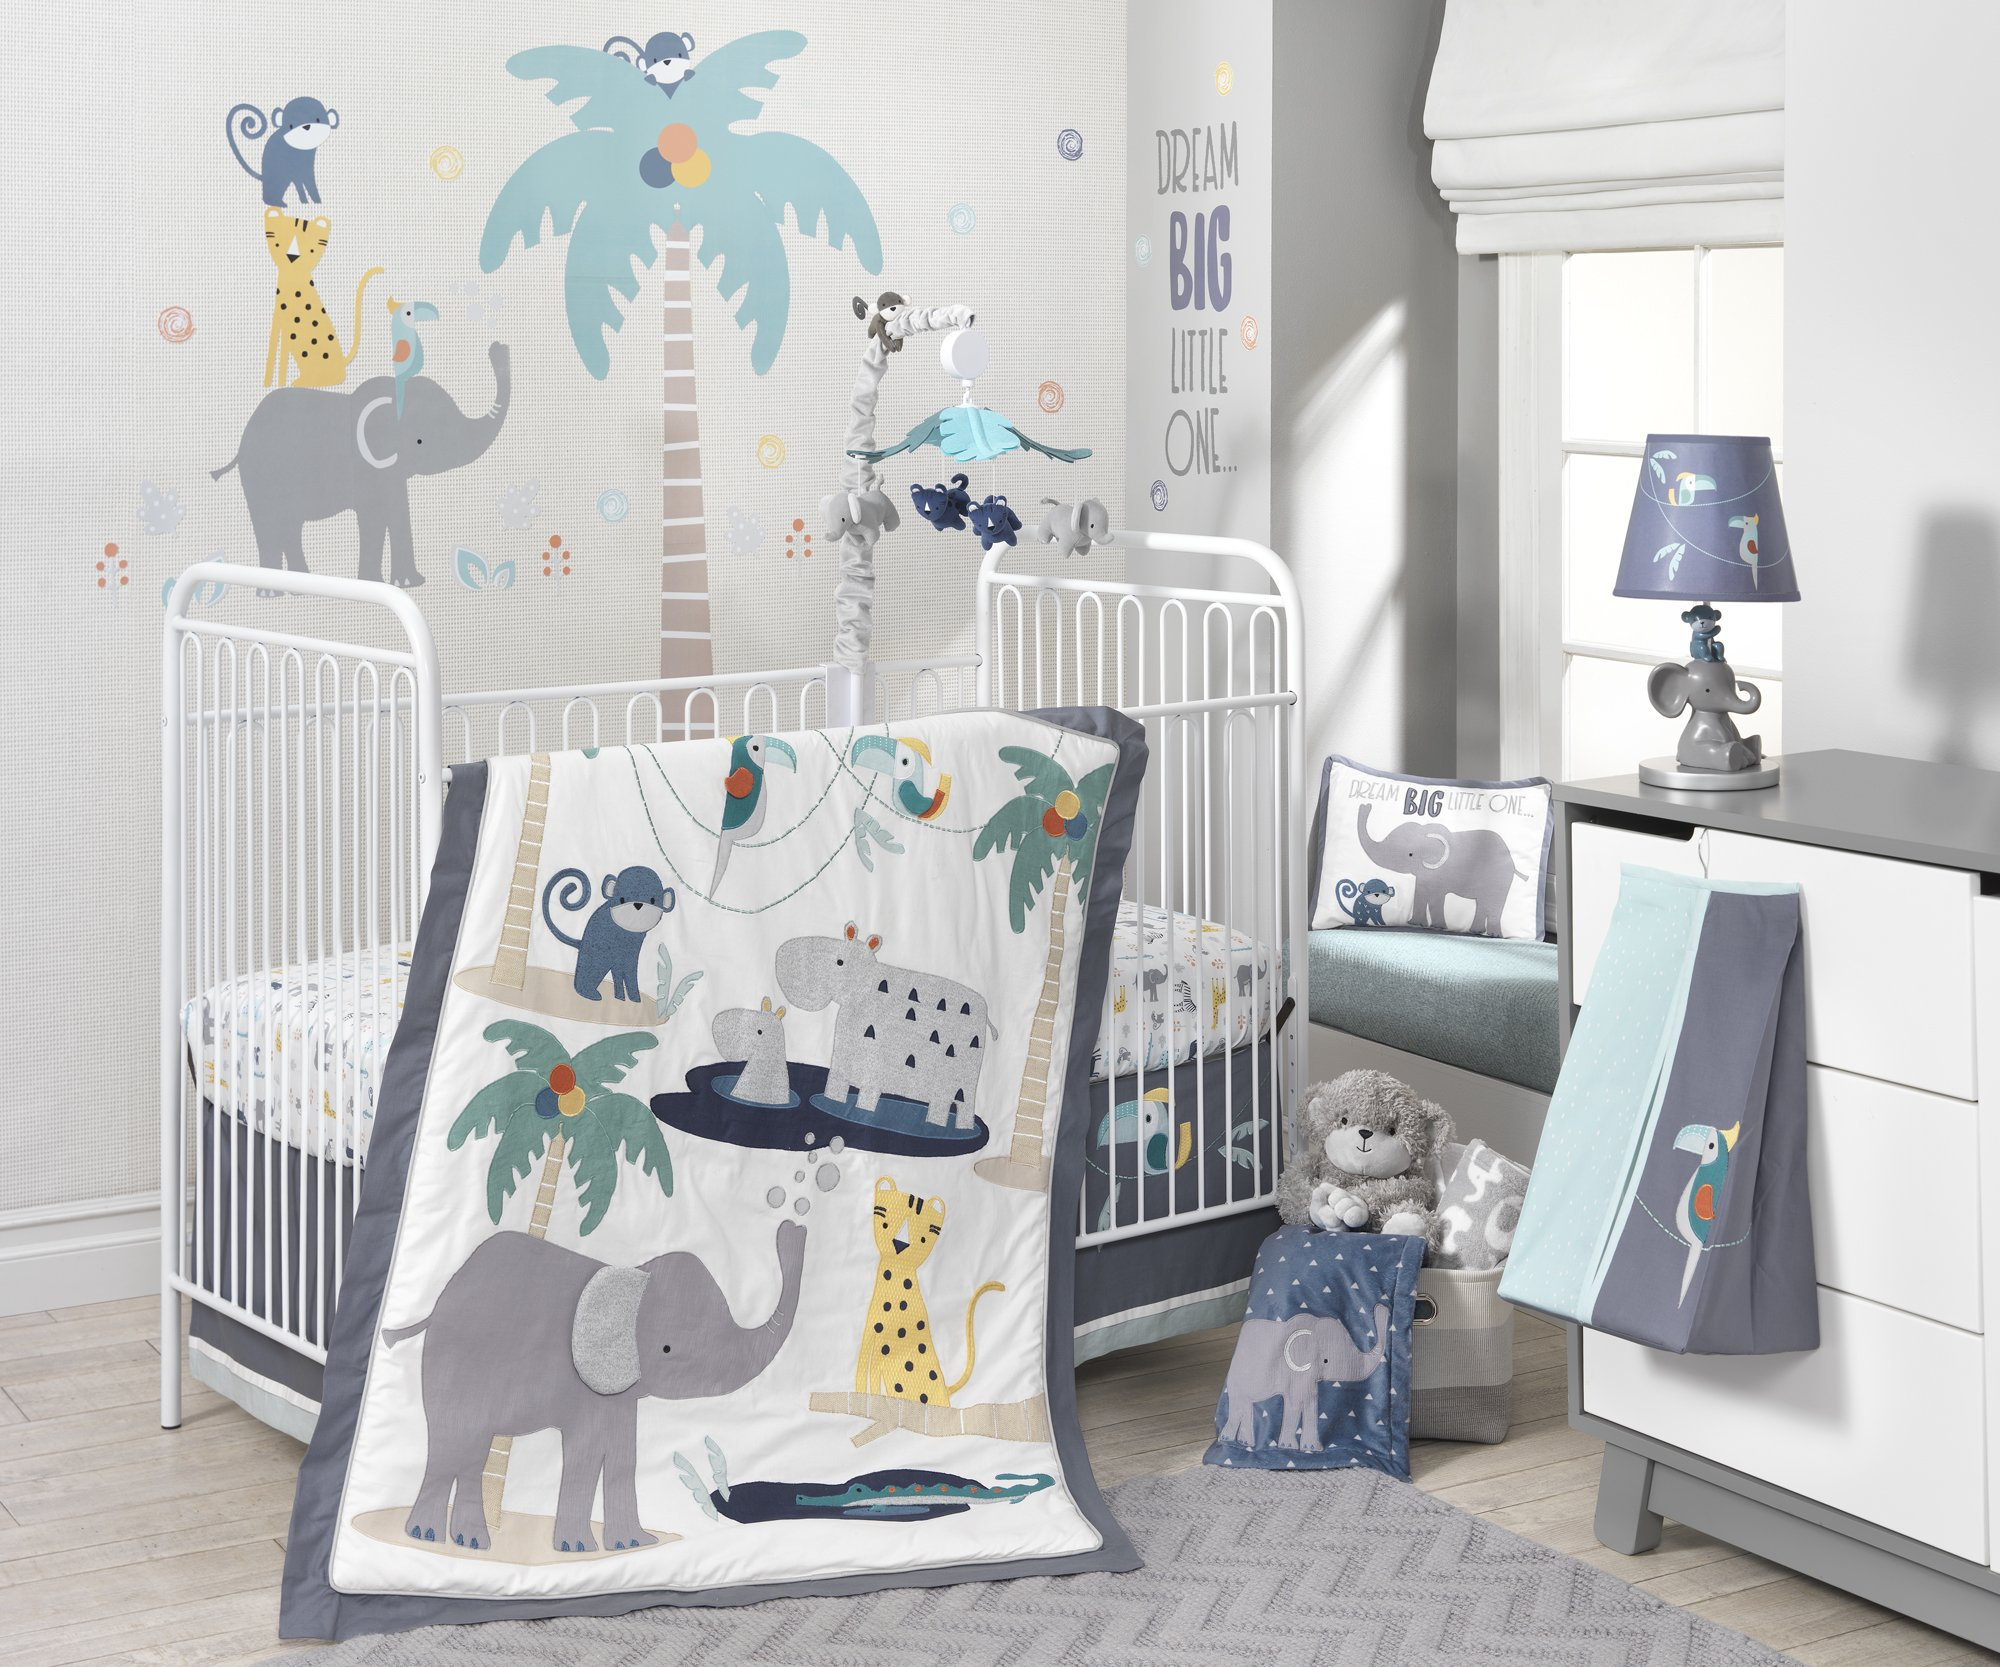 Lambs & Ivy Animal Crackers Jungle 4 Piece Crib Bedding Set, Gray/Blue